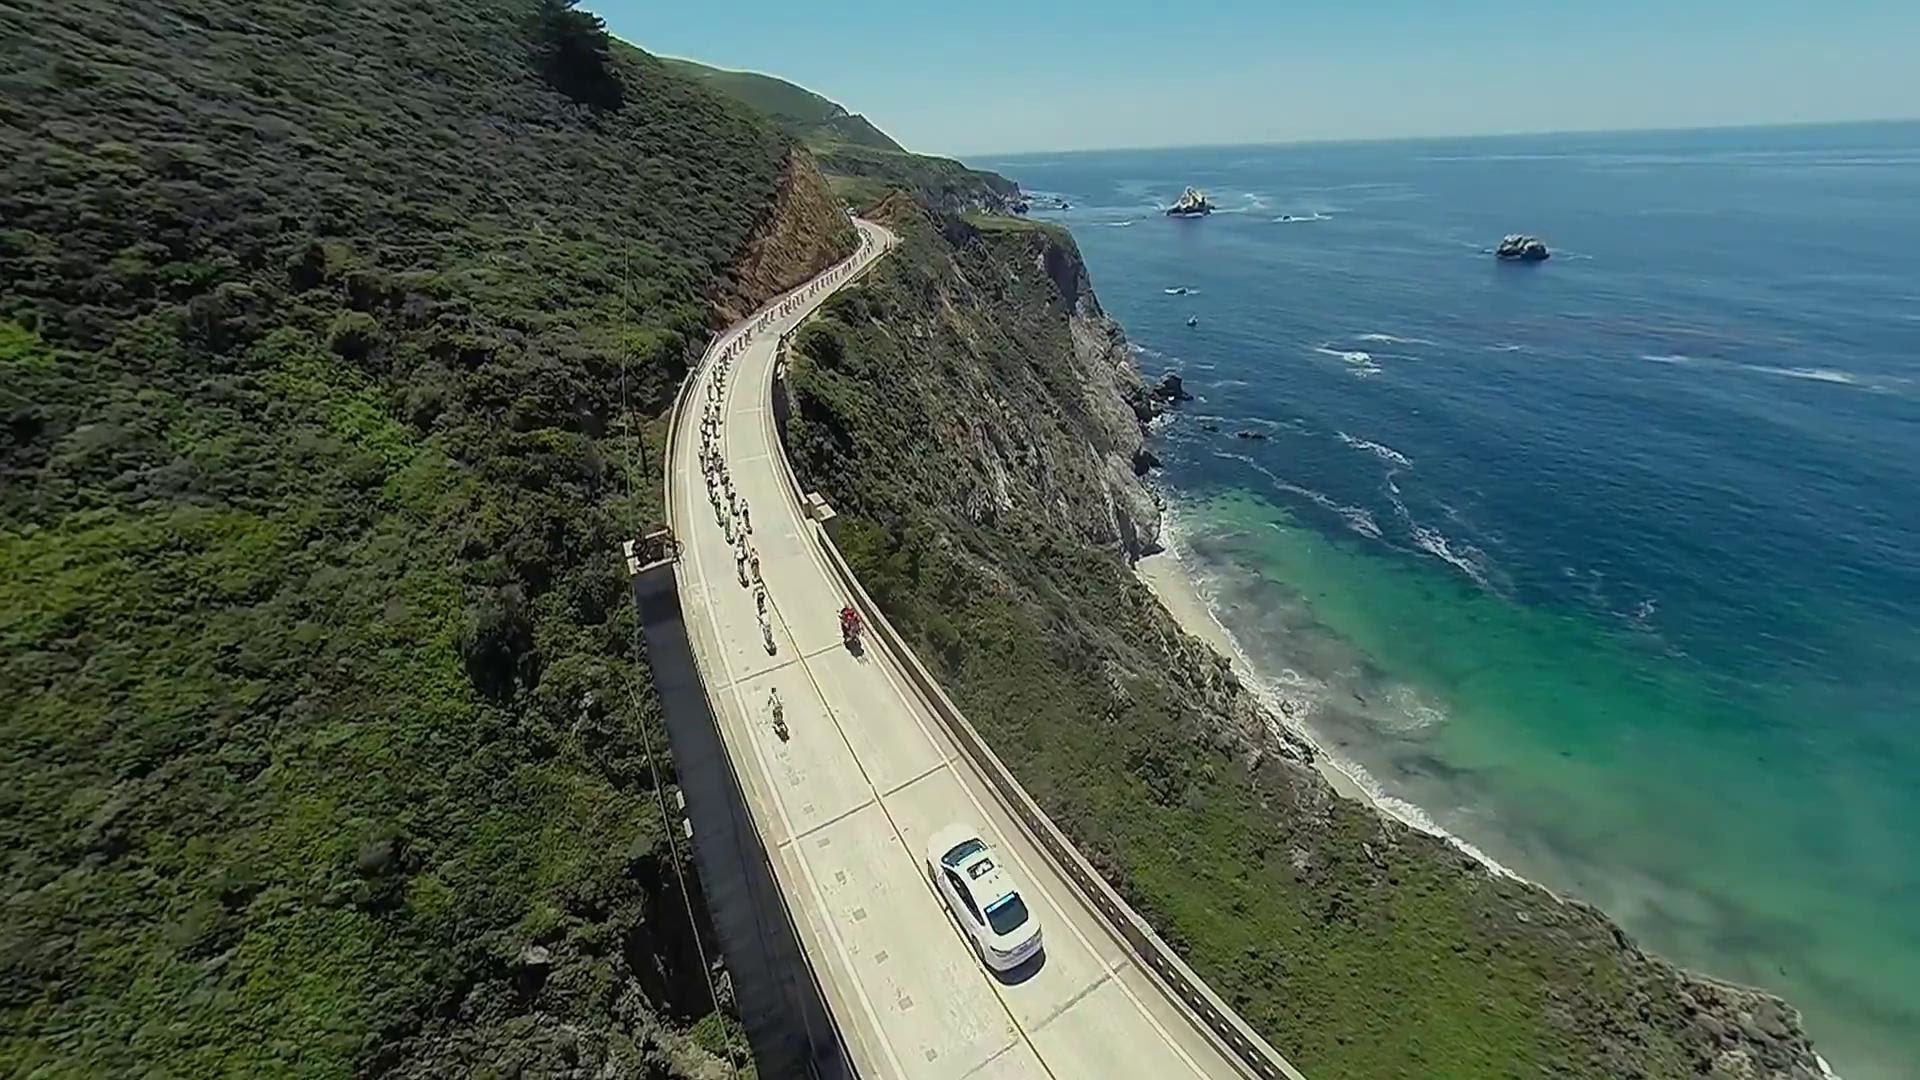 An Epic Coastal Cruise: San Francisco to Malibu